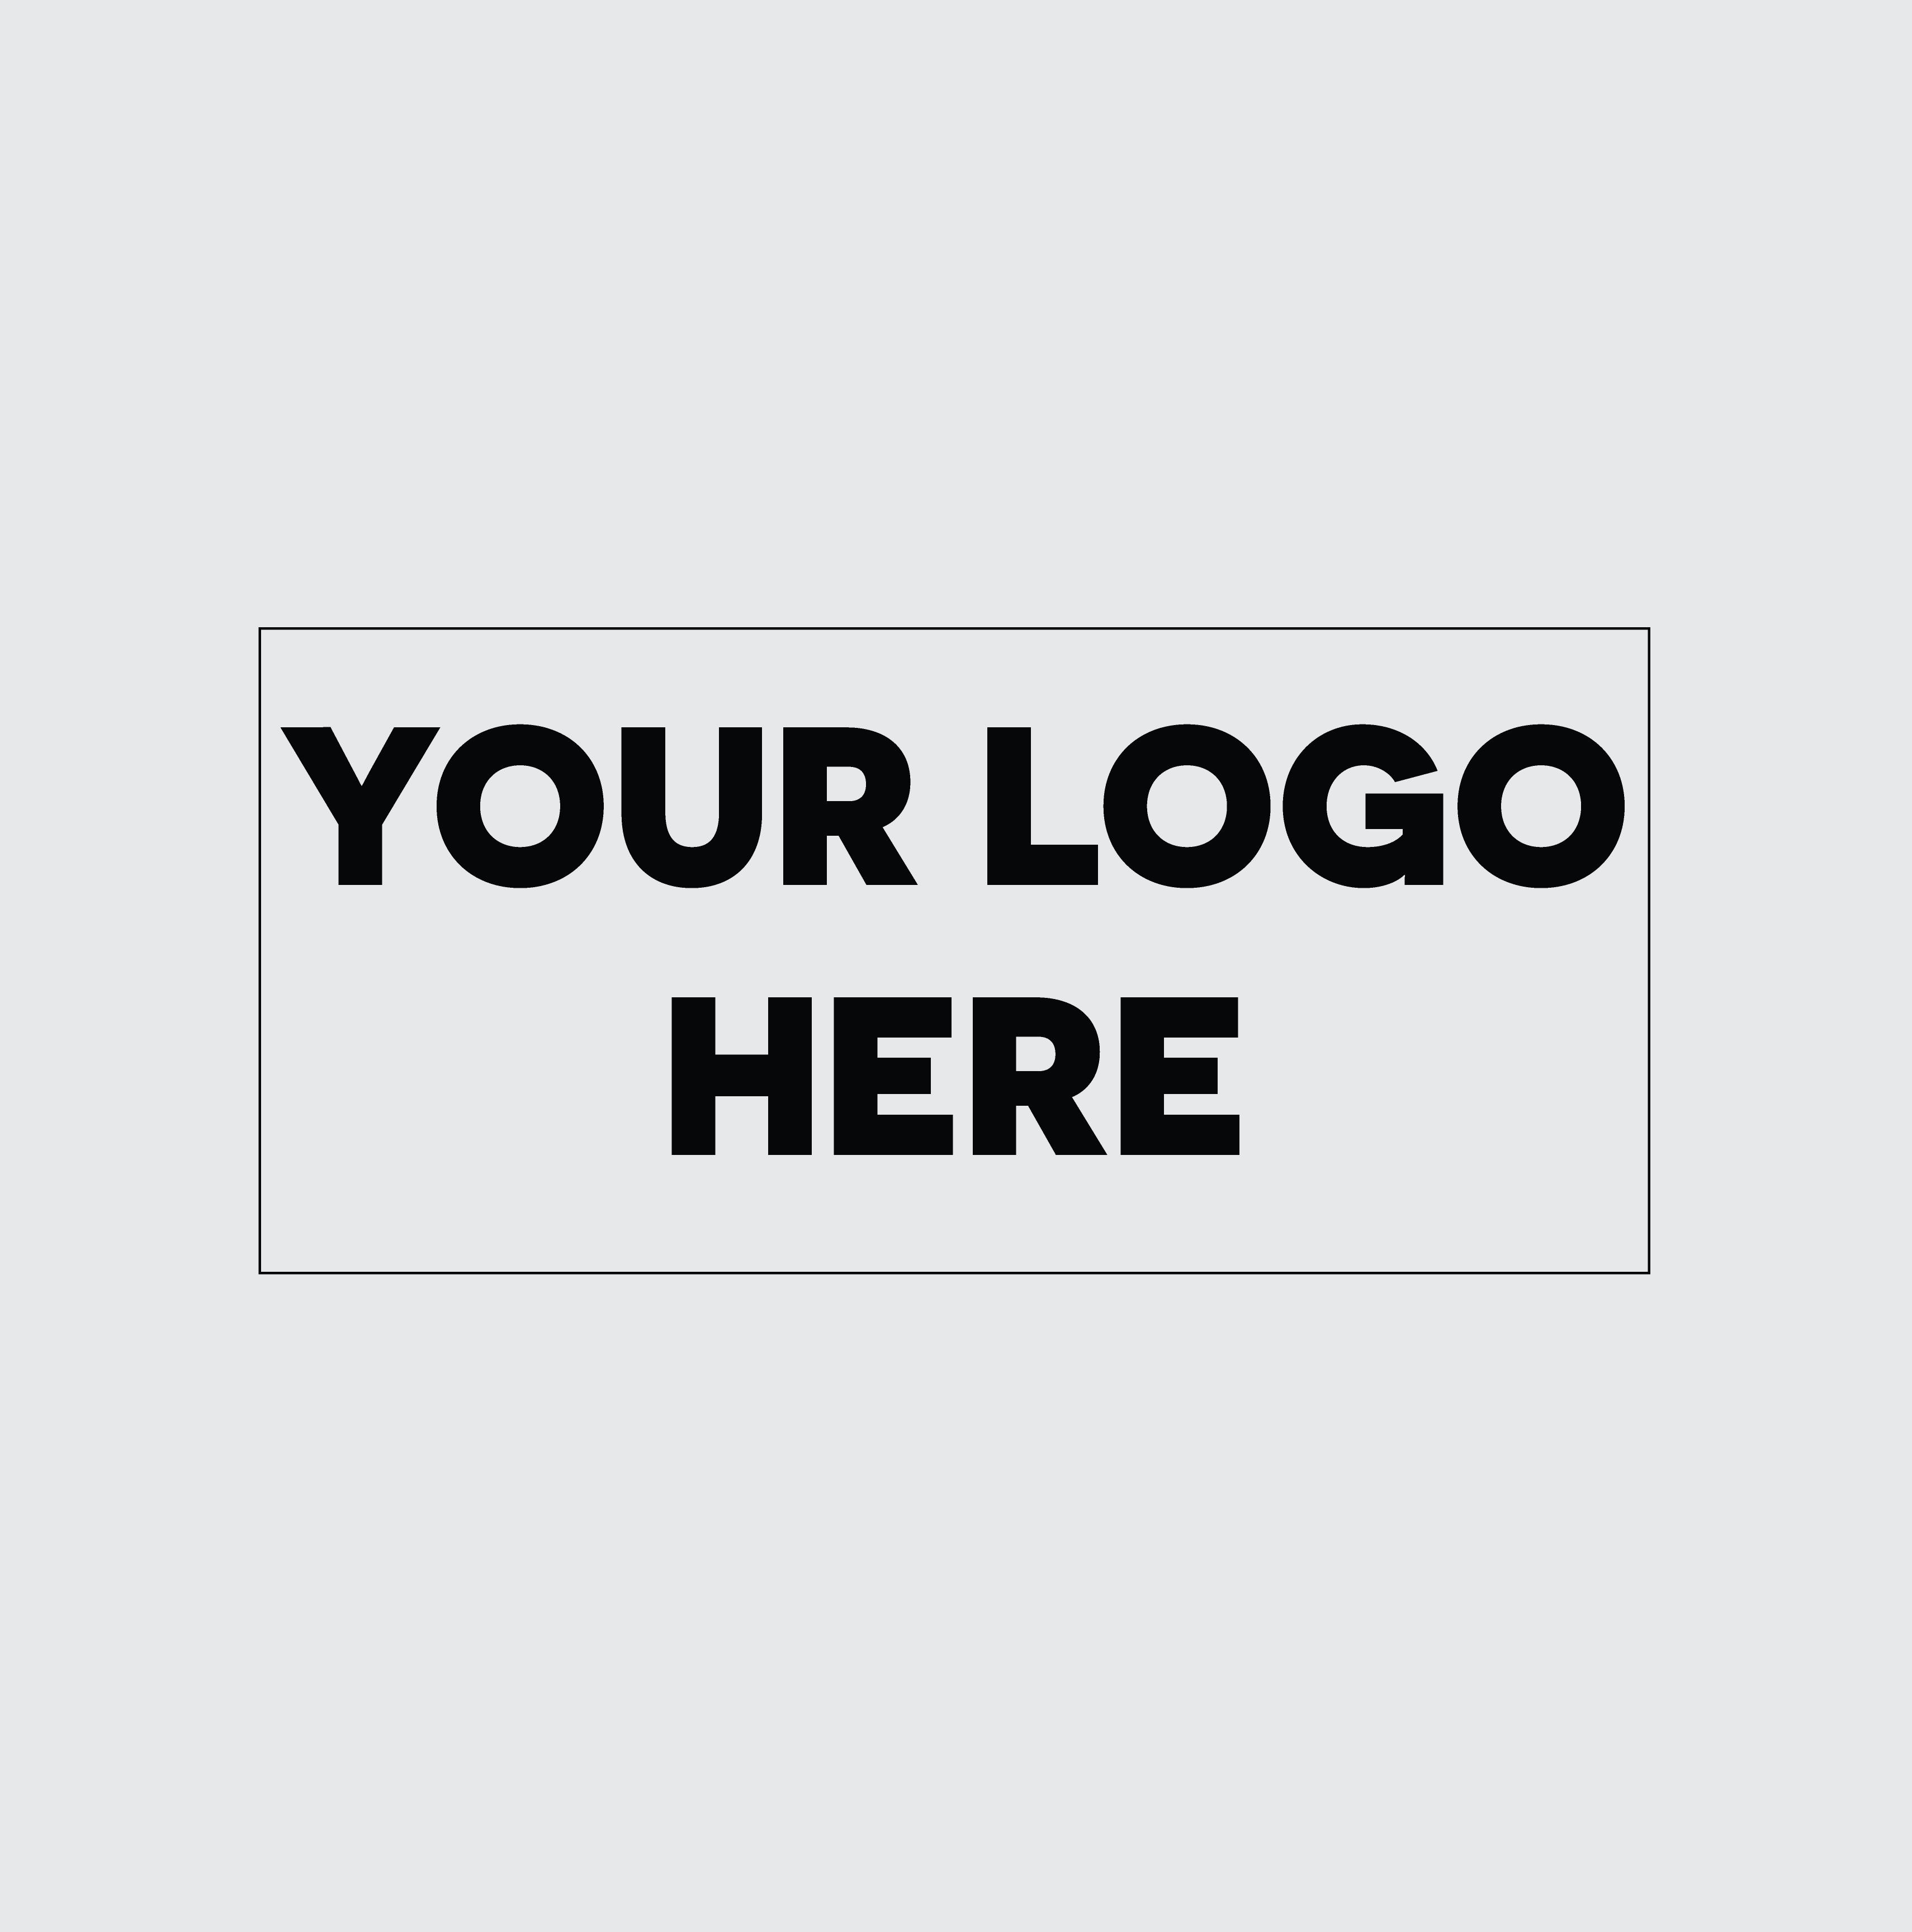 your_logo_here_proflex